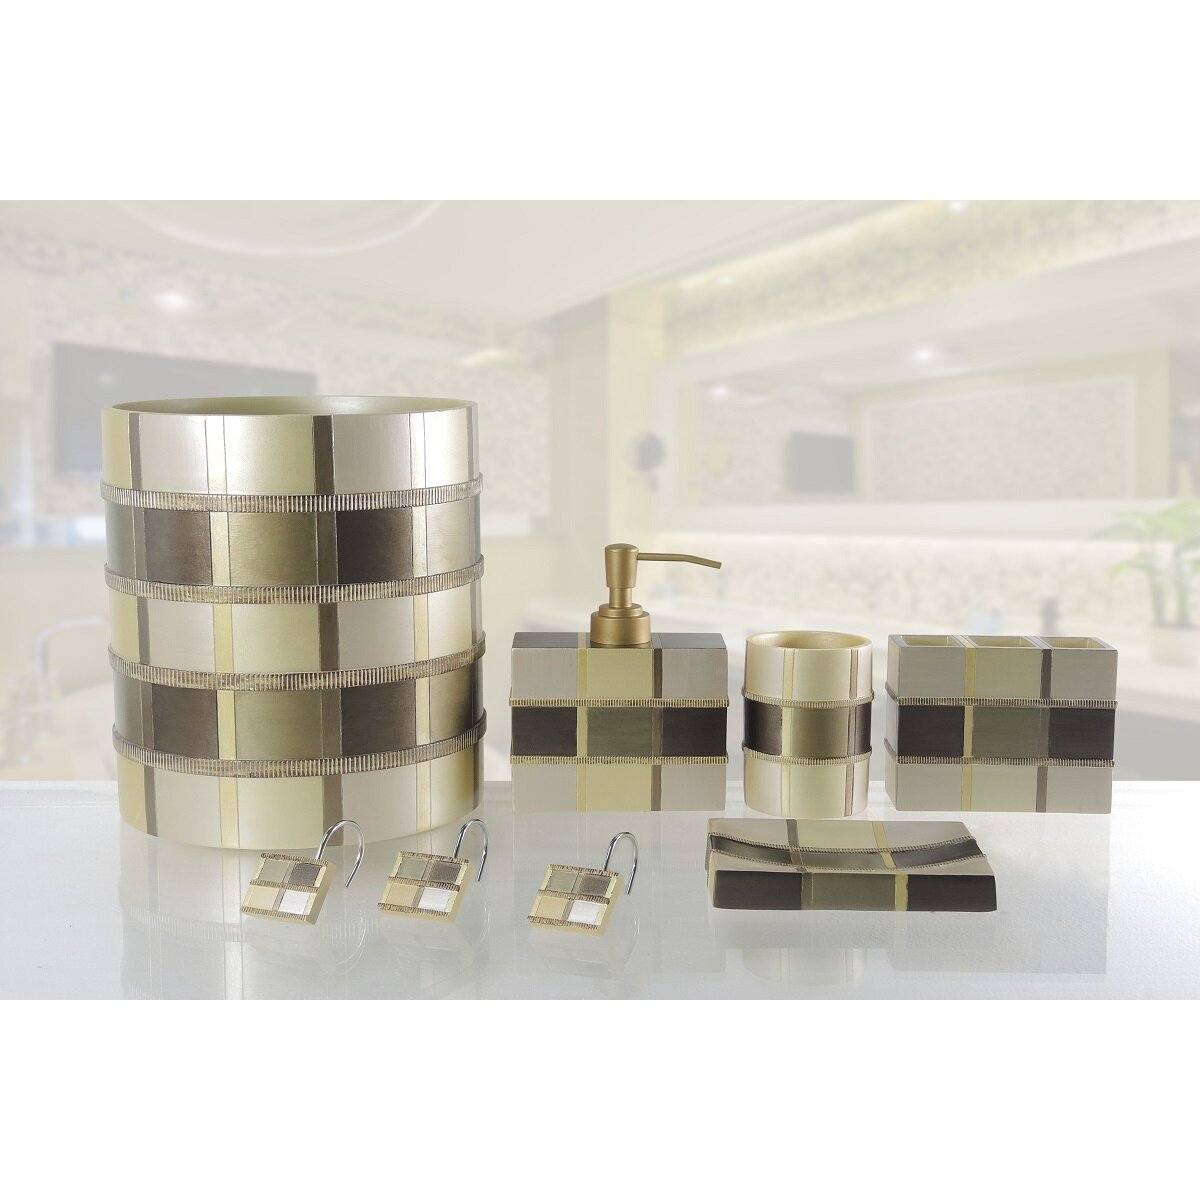 Daniels bath madison 5 piece bathroom hardware set wayfair for Bathroom 5 piece set